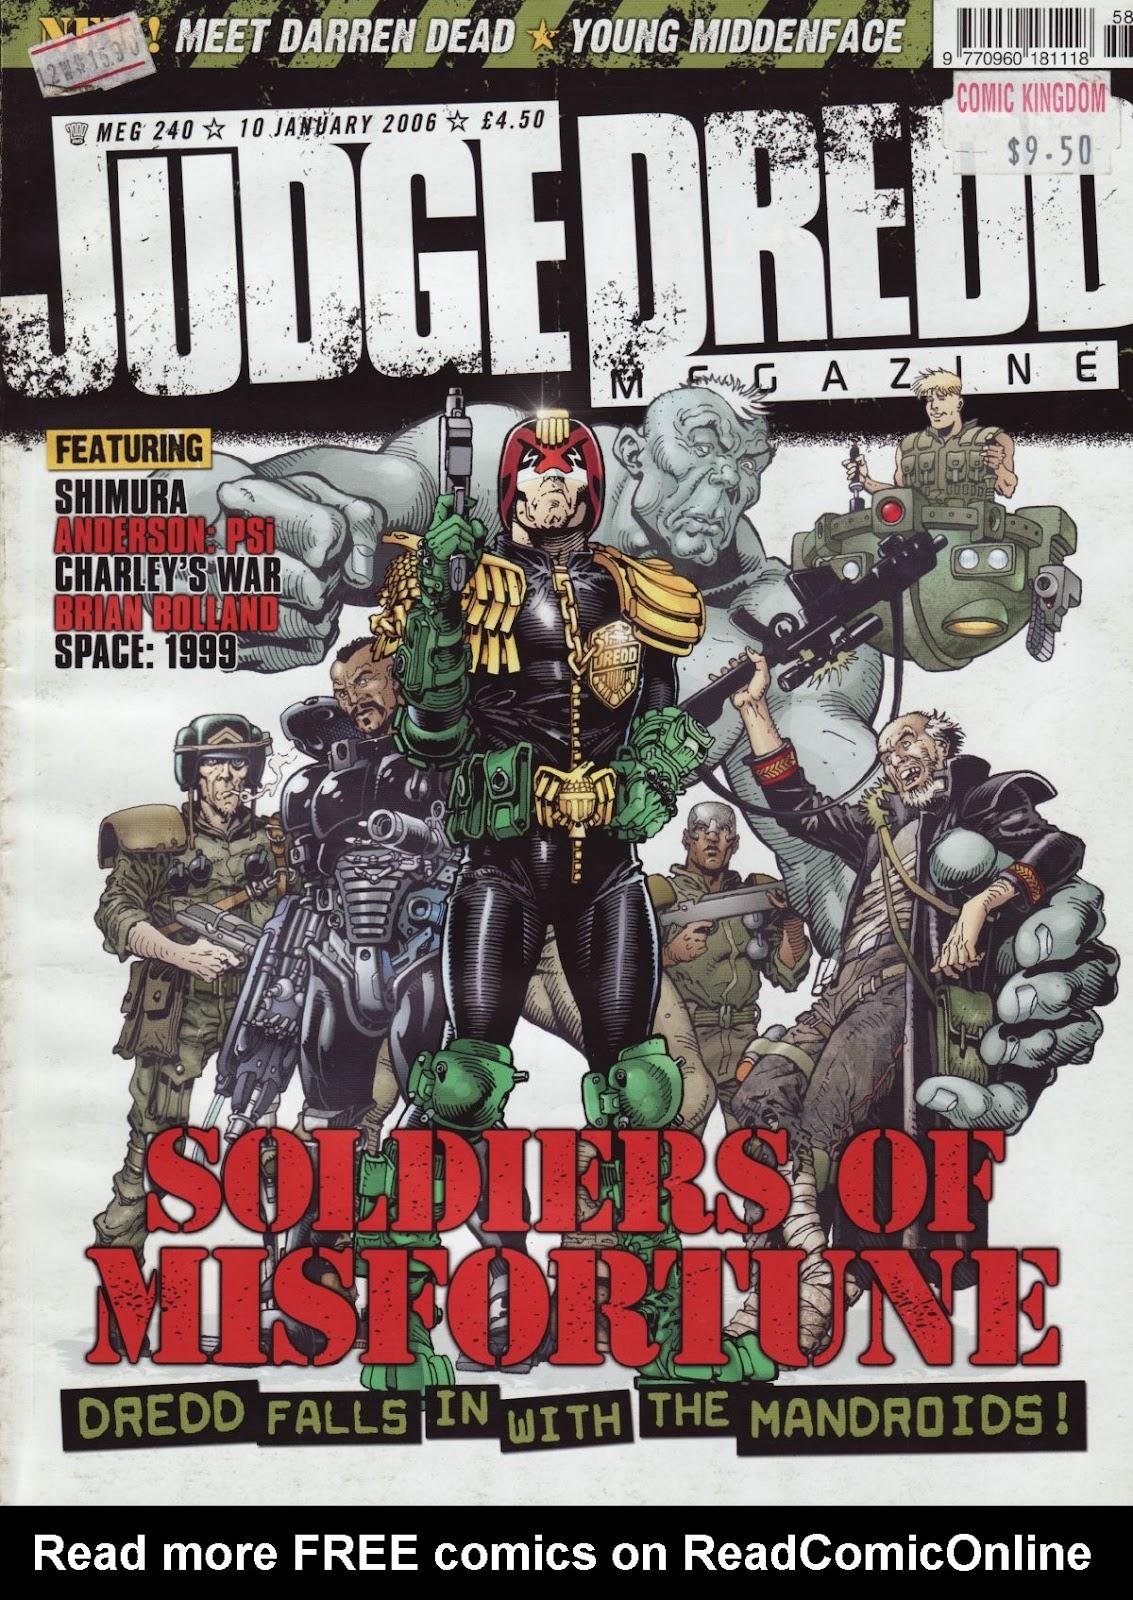 Judge Dredd Megazine (Vol. 5) issue 240 - Page 1